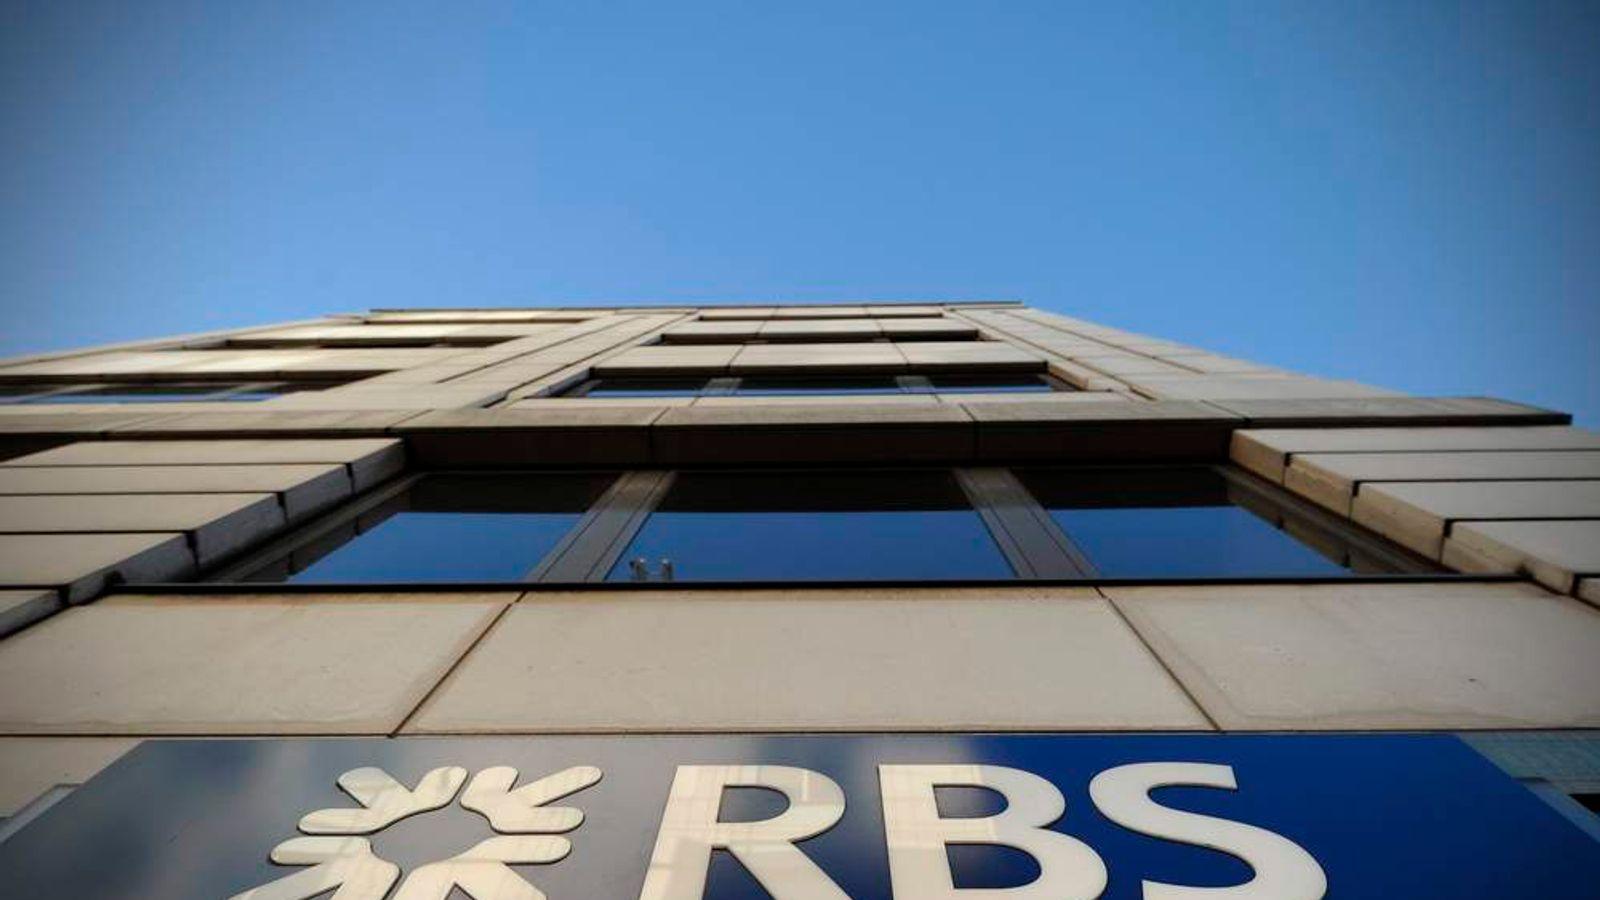 Royal Bank of Scotland branch